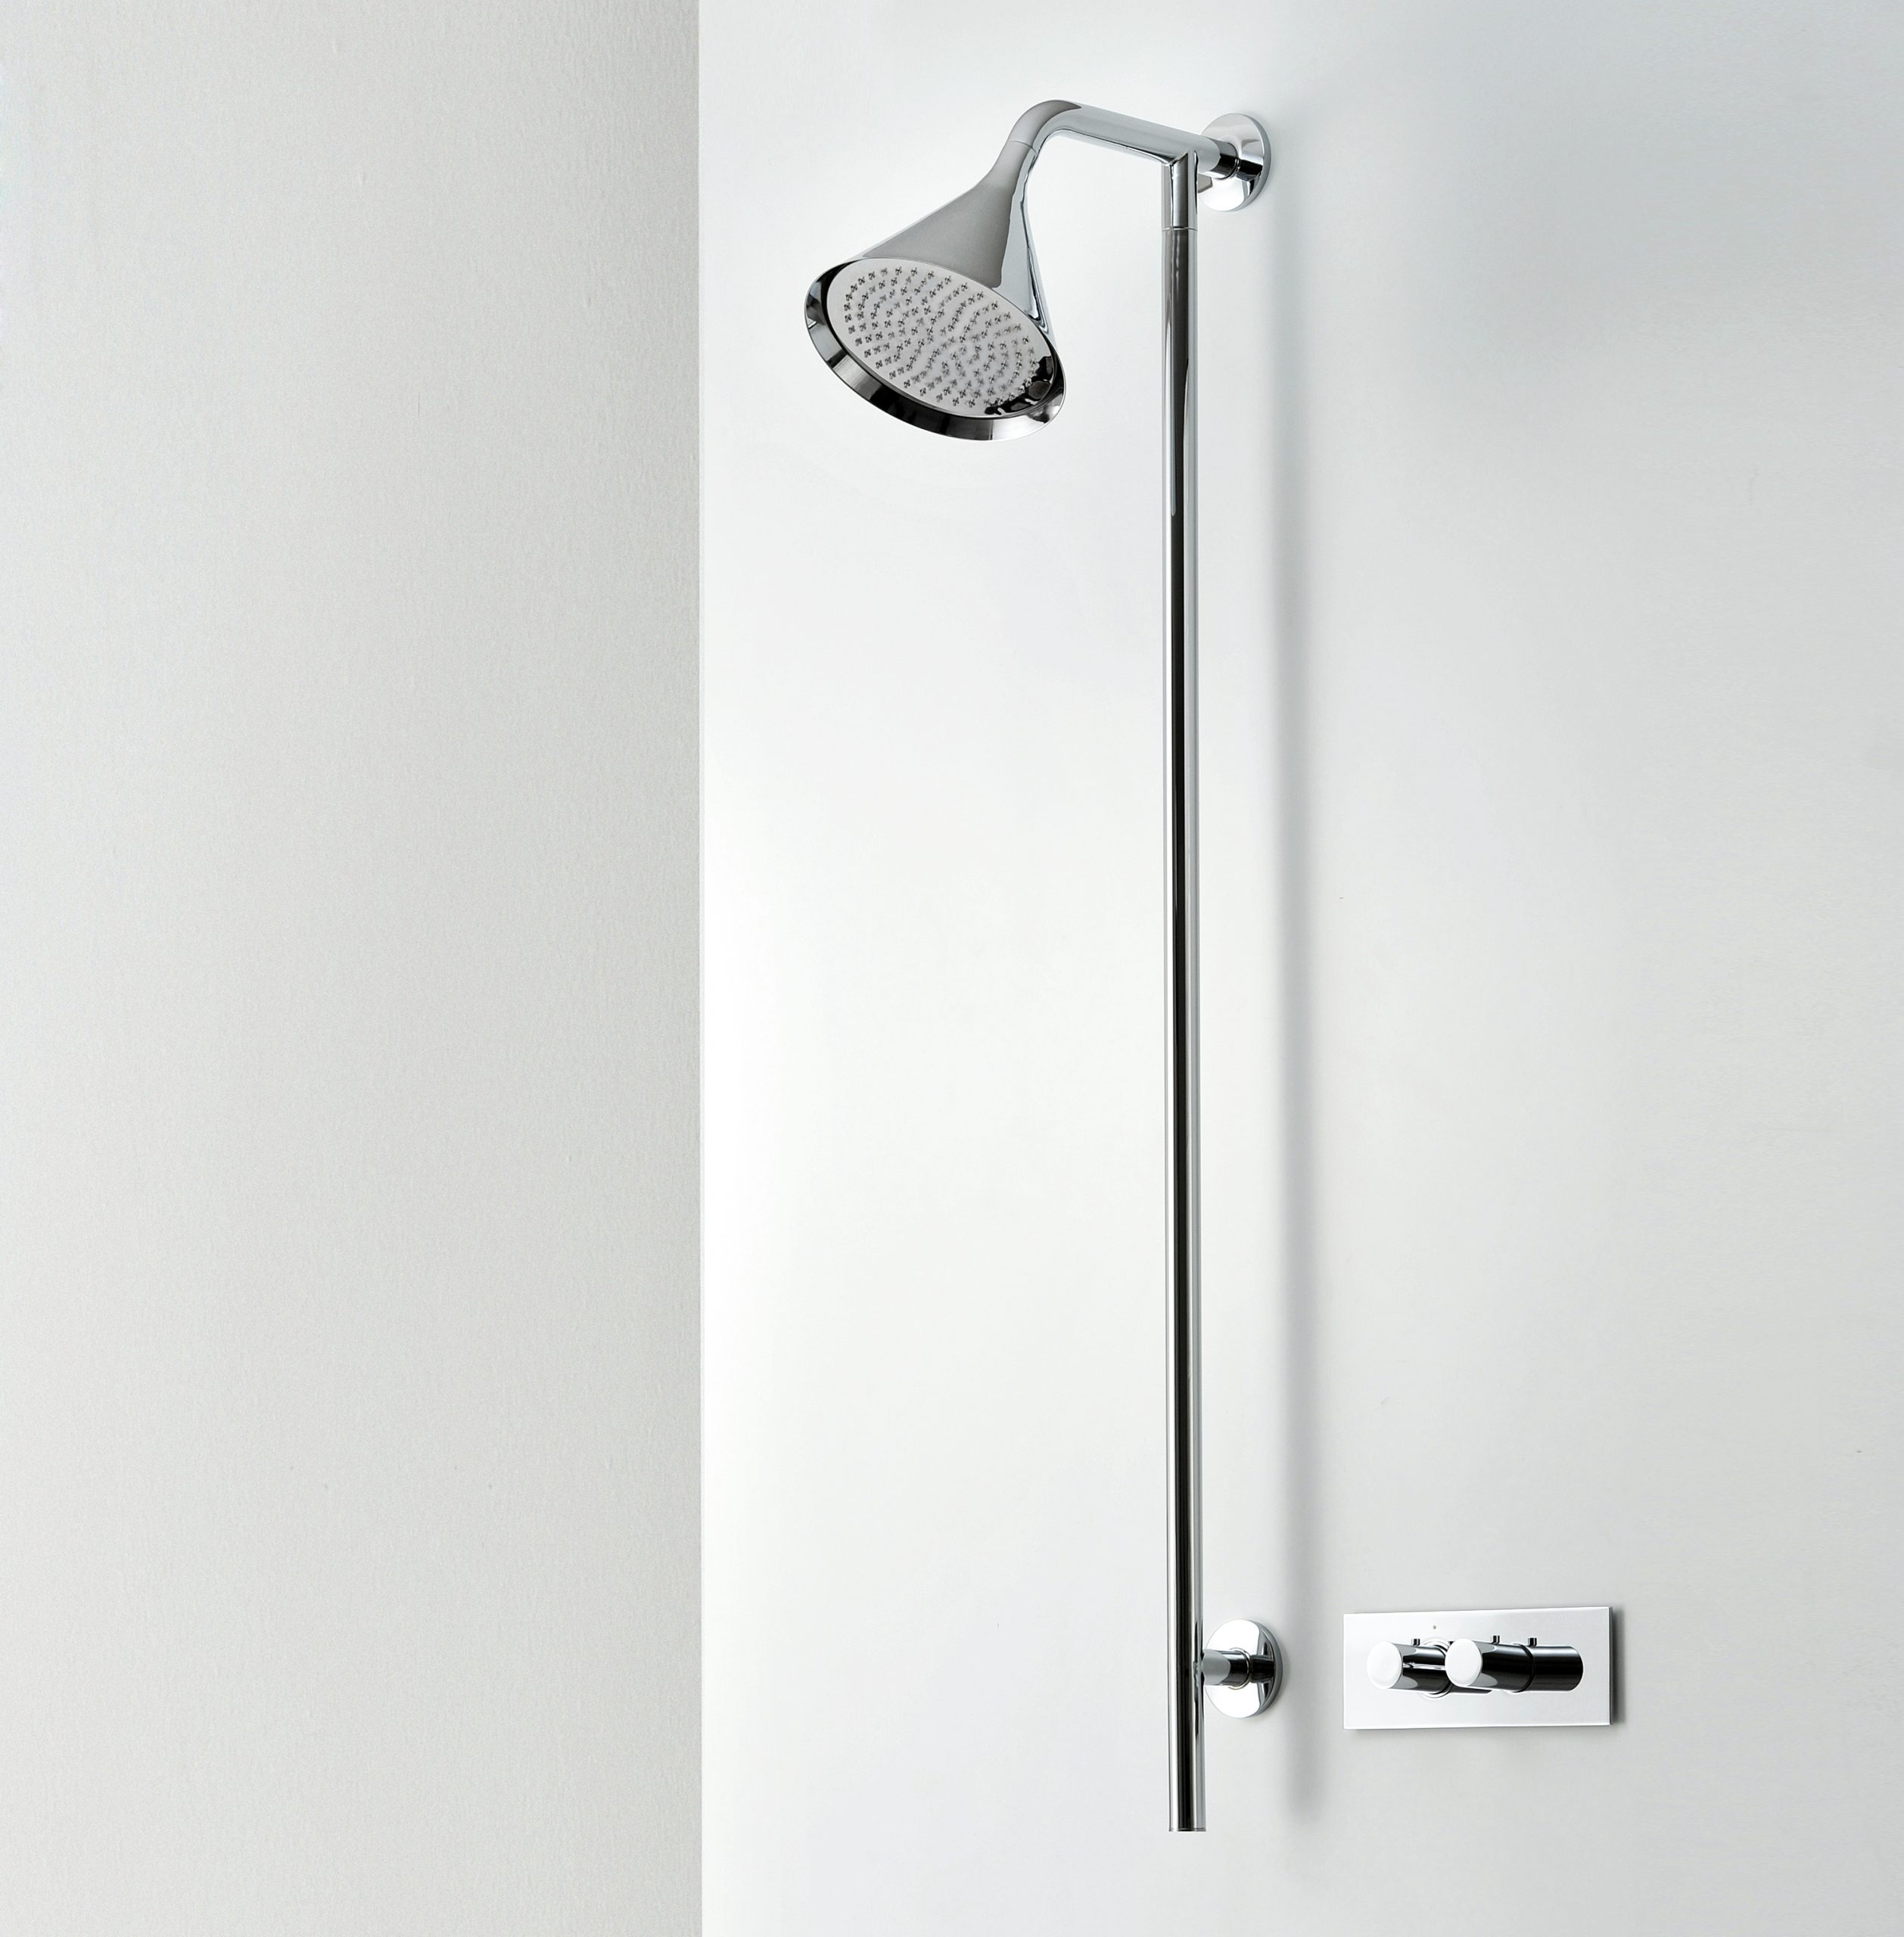 Swing shower head by Debiasi Sandri for Bonomi